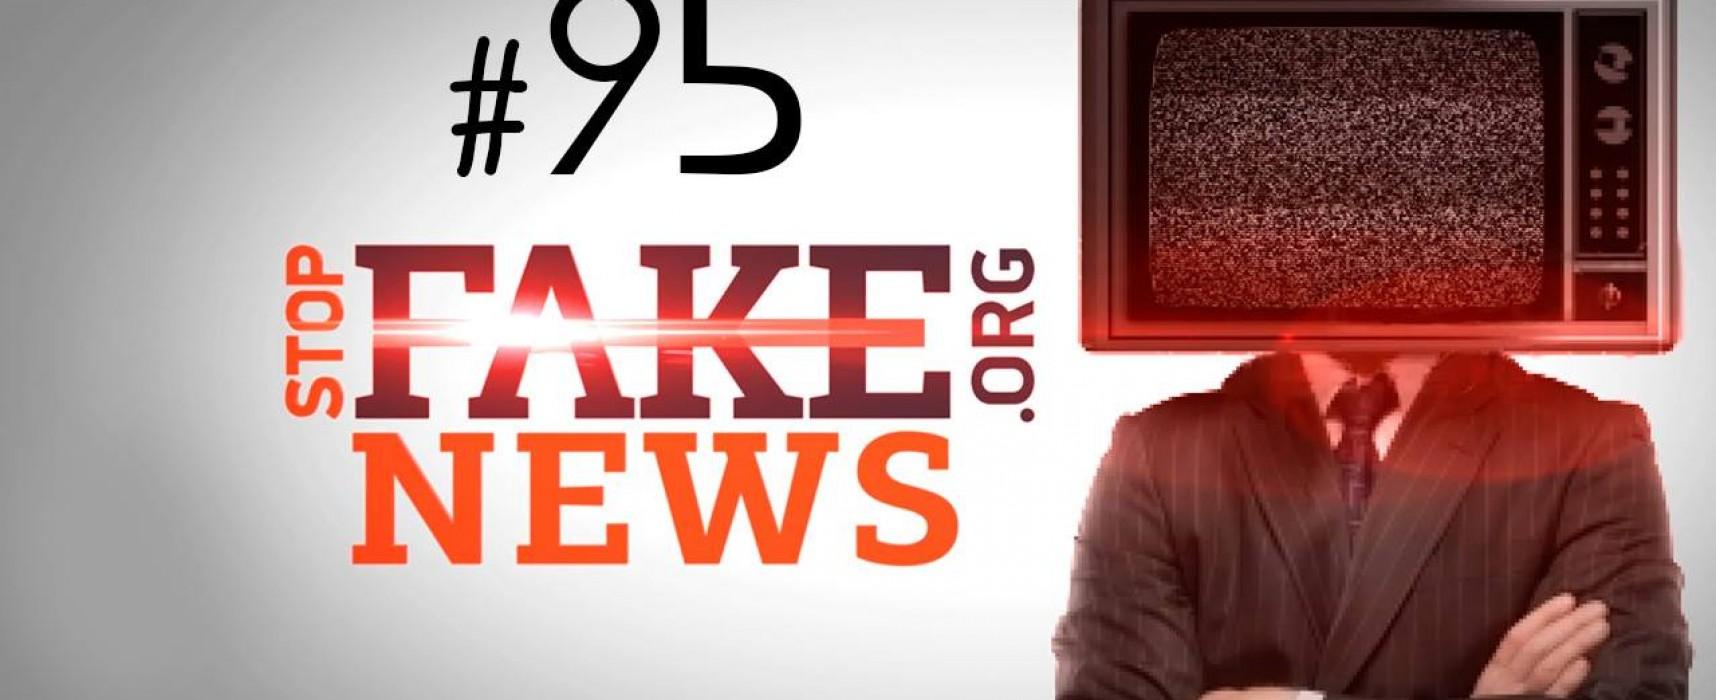 StopFakeNews #95. Лавров якобы не знает условий Будапештского меморандума